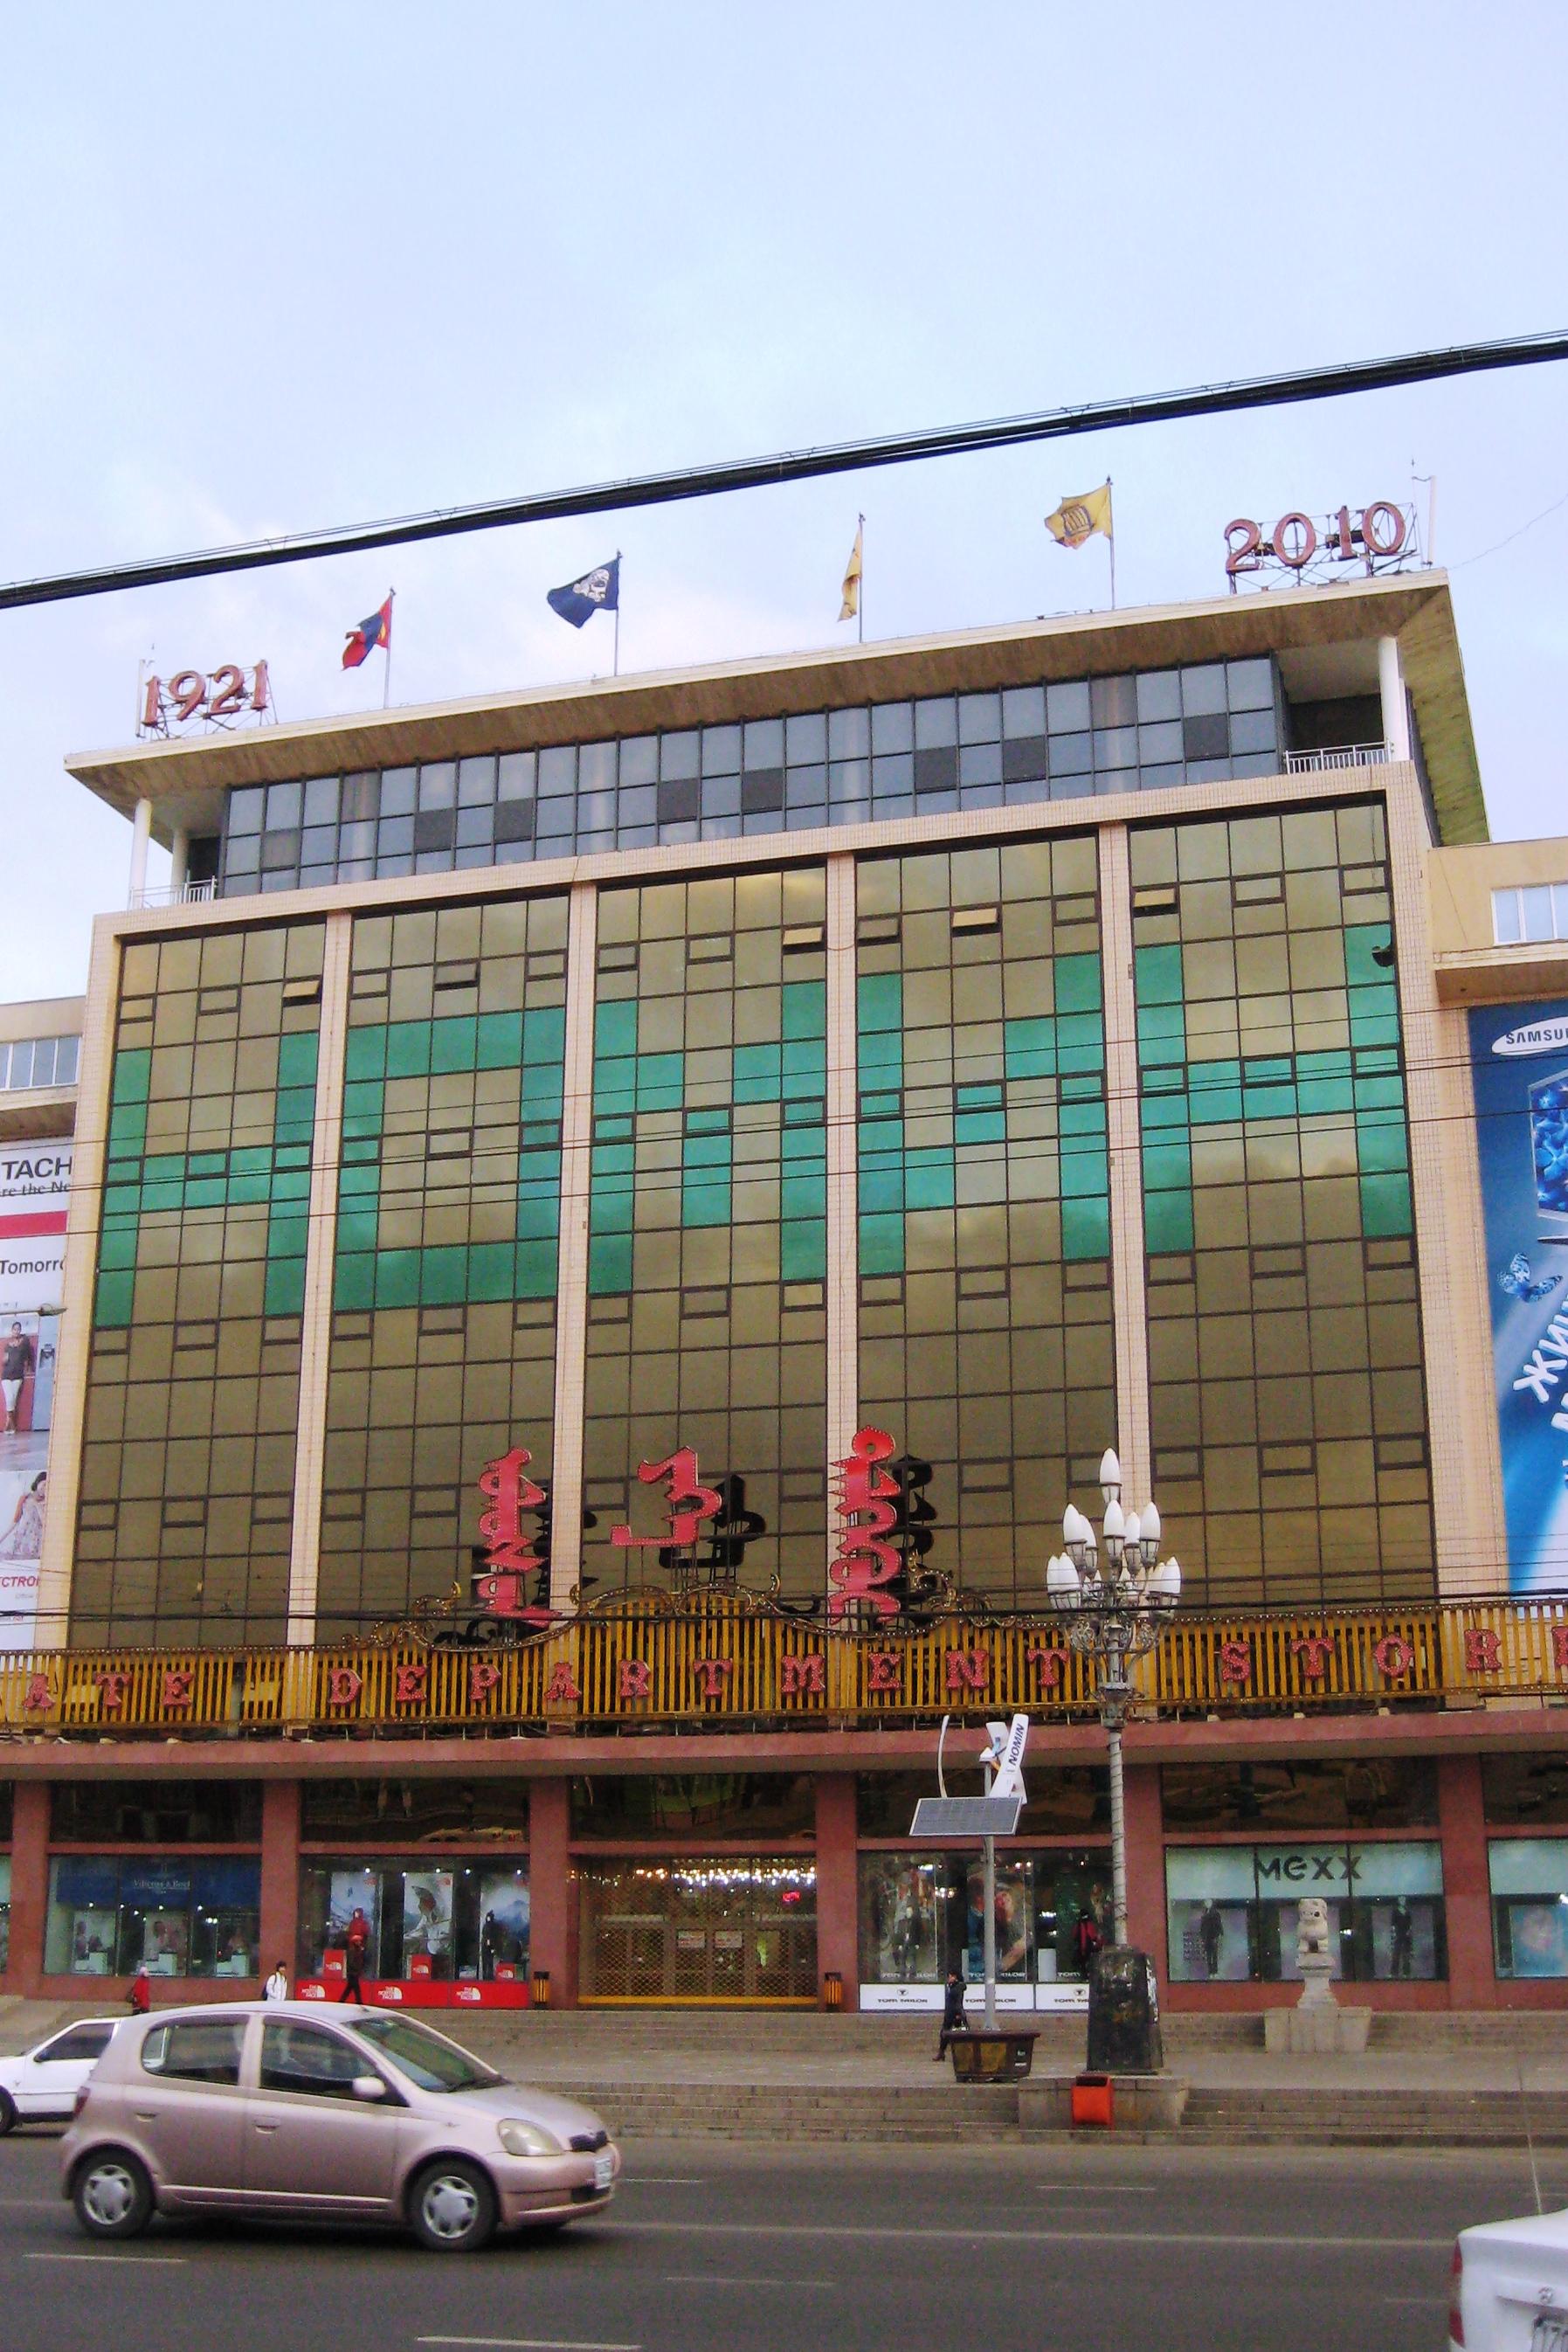 Nomin State Department Store - Ulaanbaatar, Mongolia